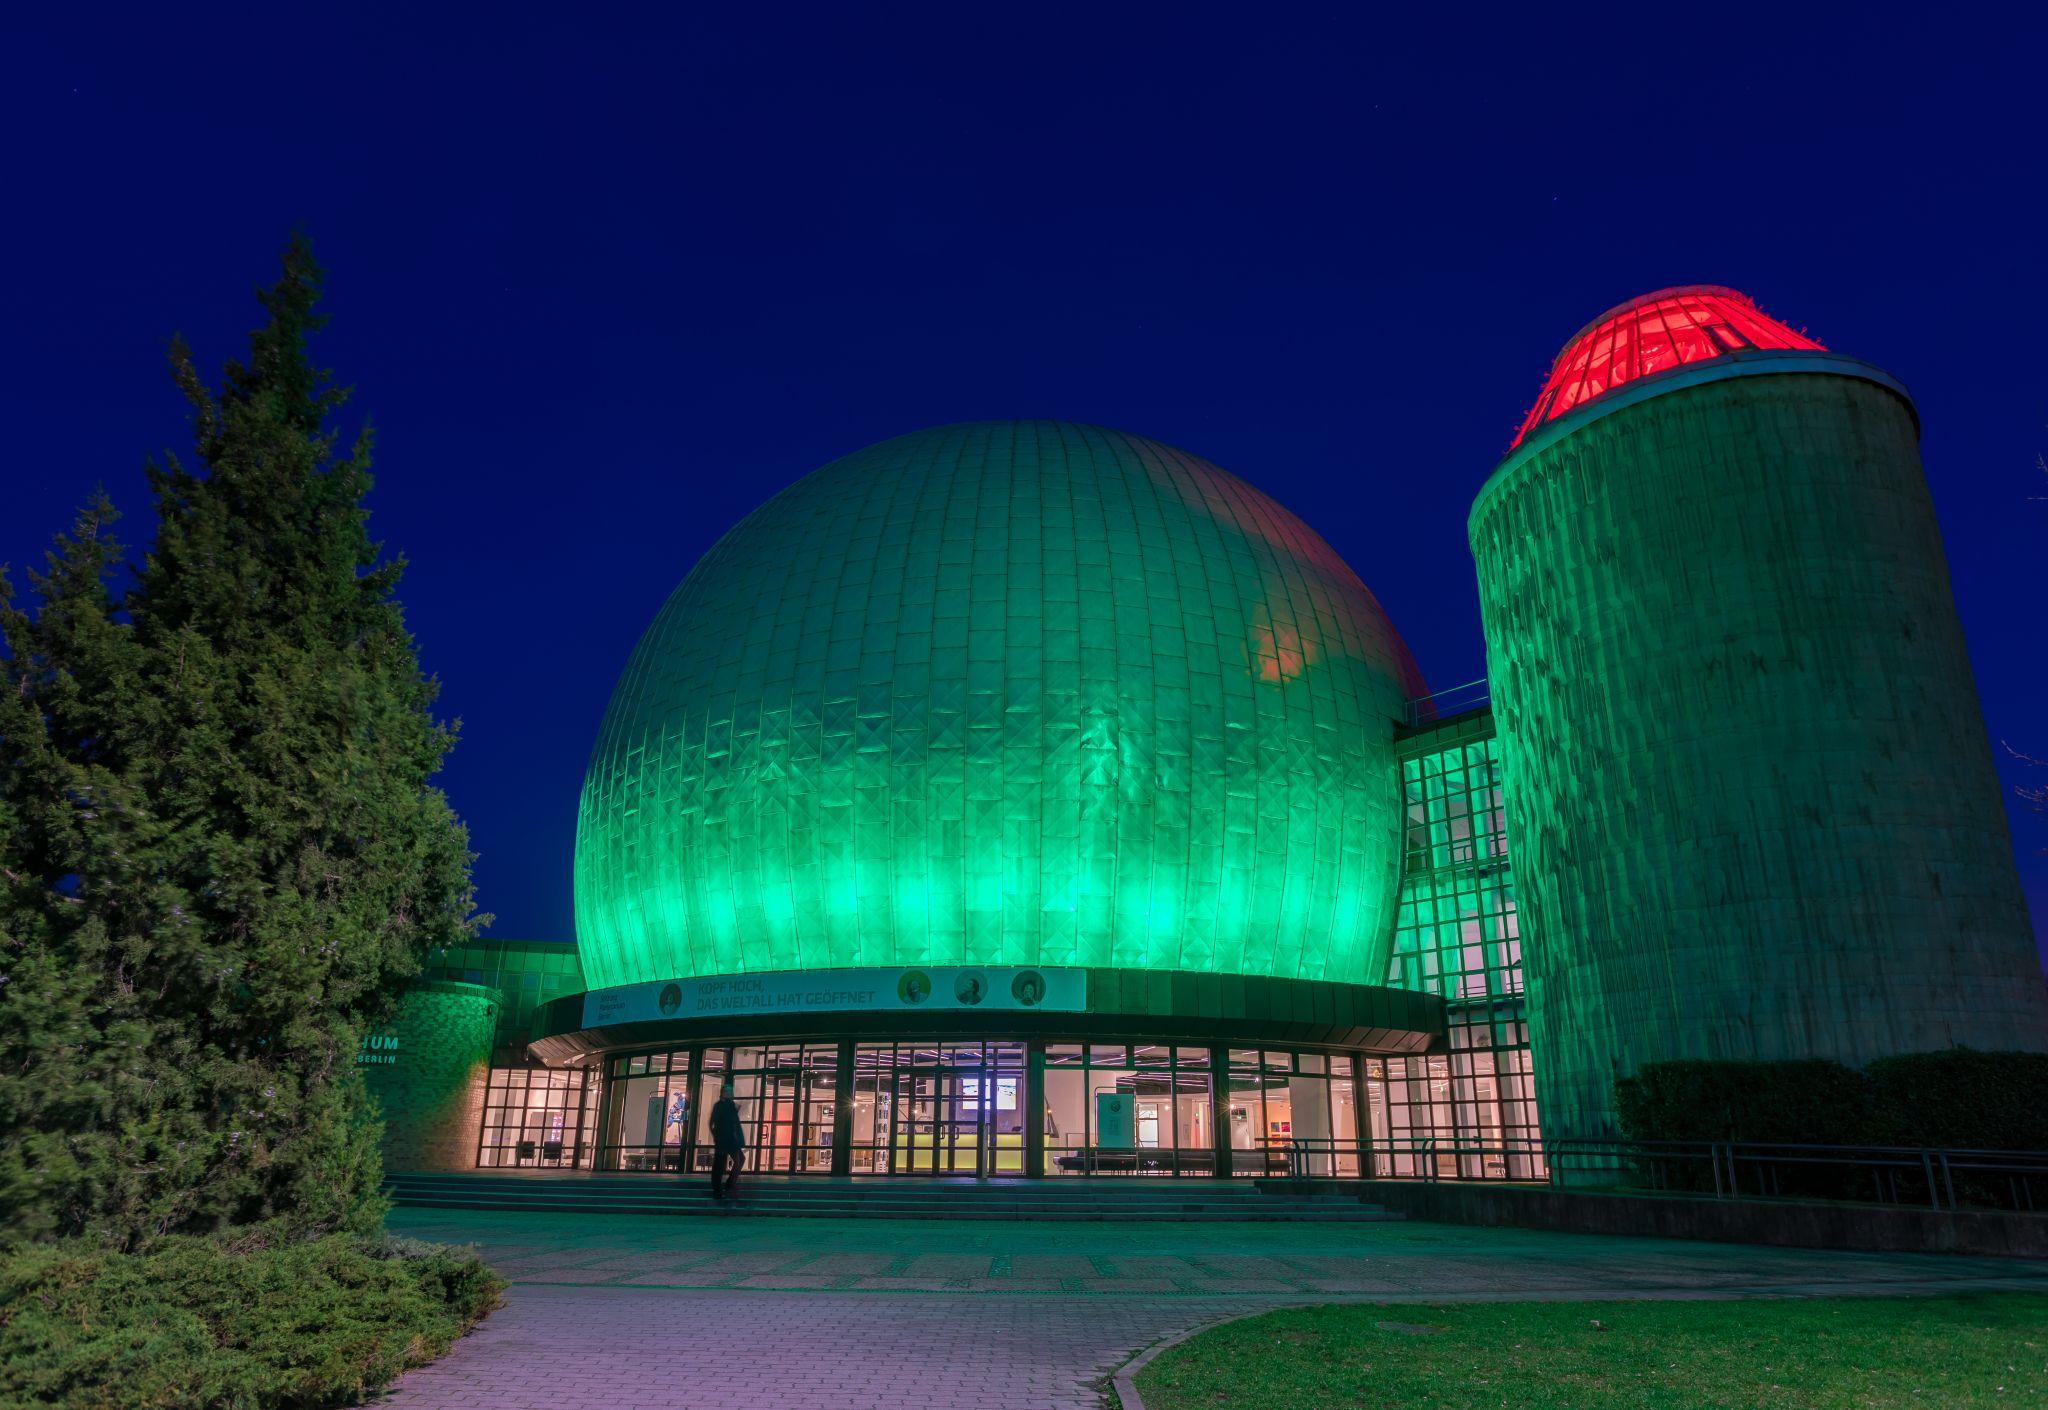 Zeiss-Großplanetarium, Germany